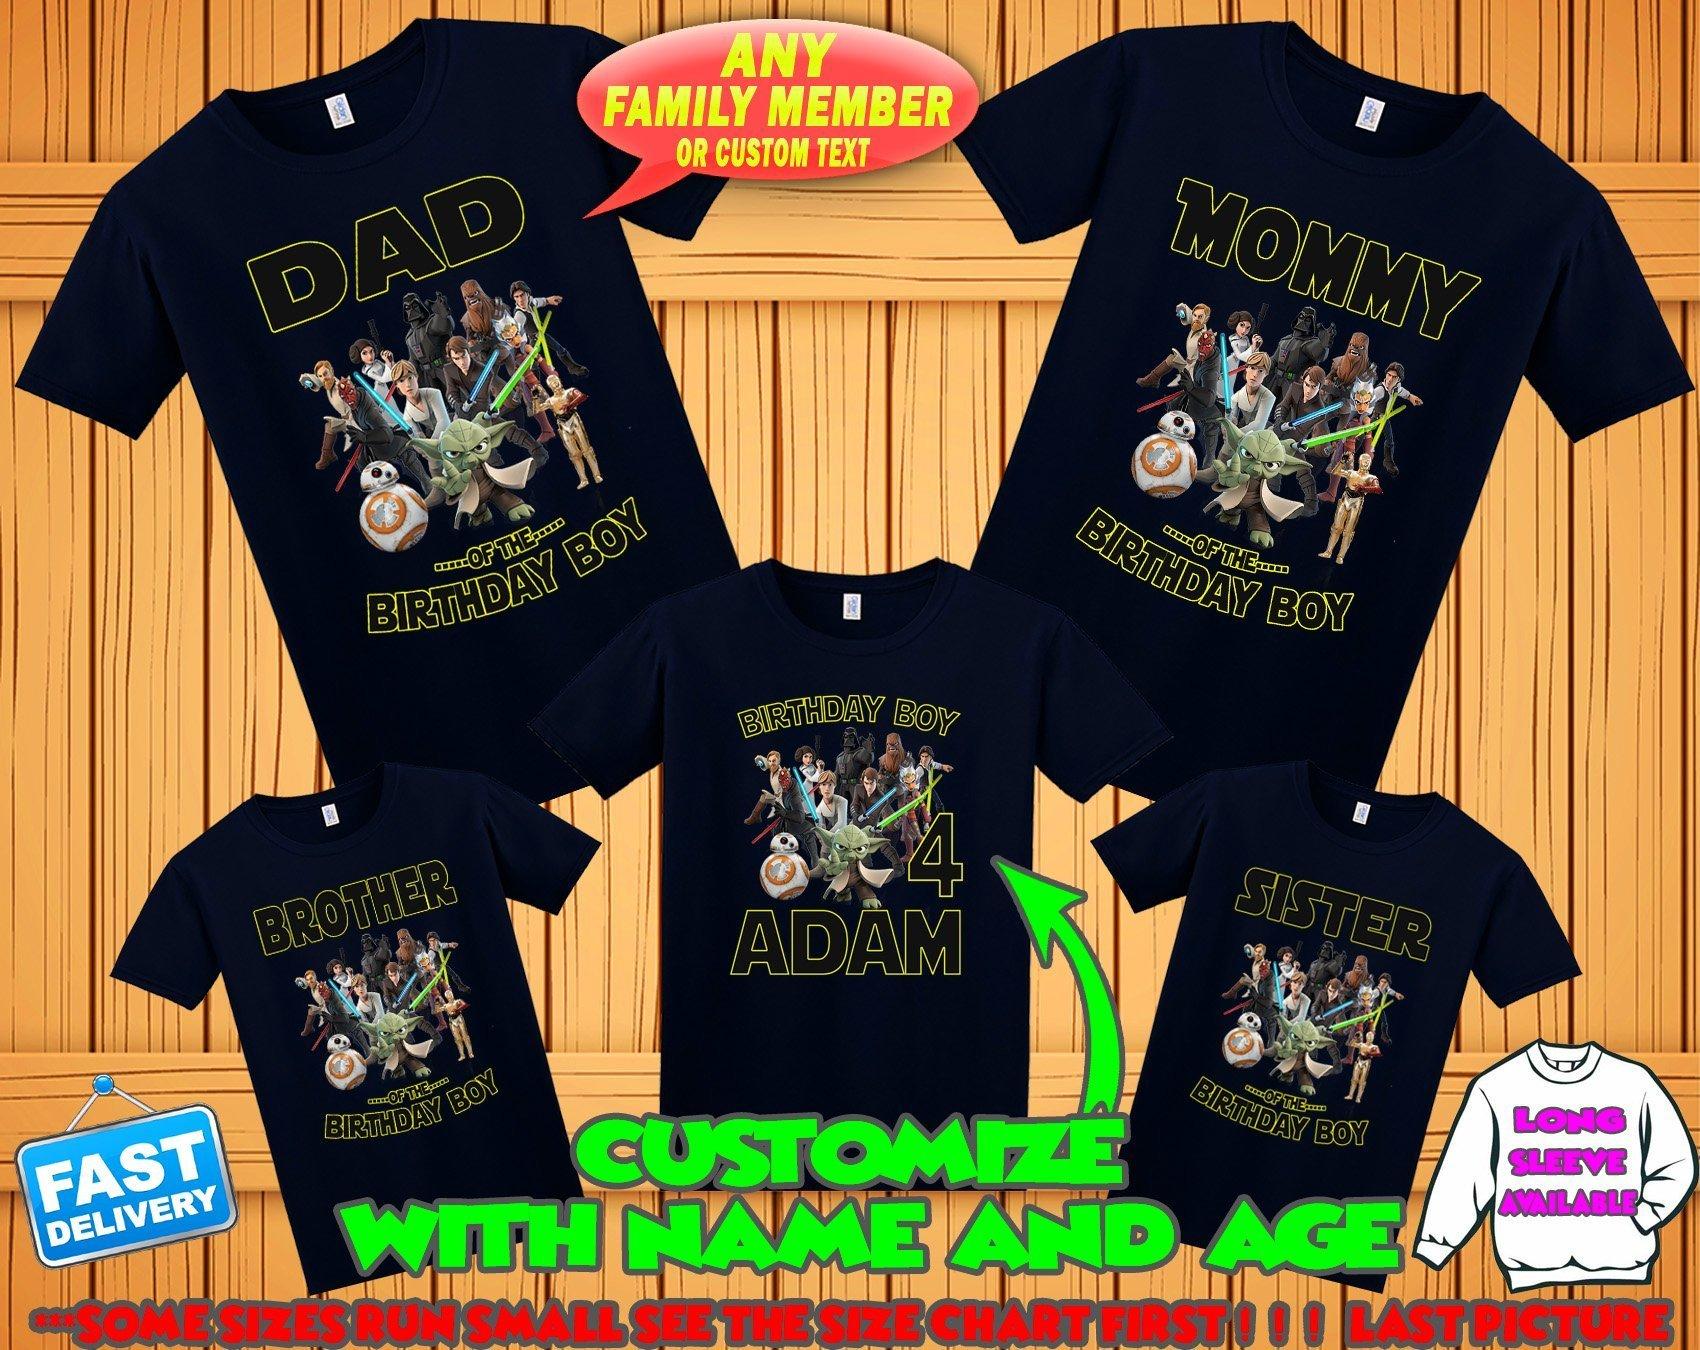 Star Wars birthday shirt, Star Wars family shirts, Star Wars theme party tshirts,Star Wars matching shirts, Star Wars boy's shirt, Star Wars